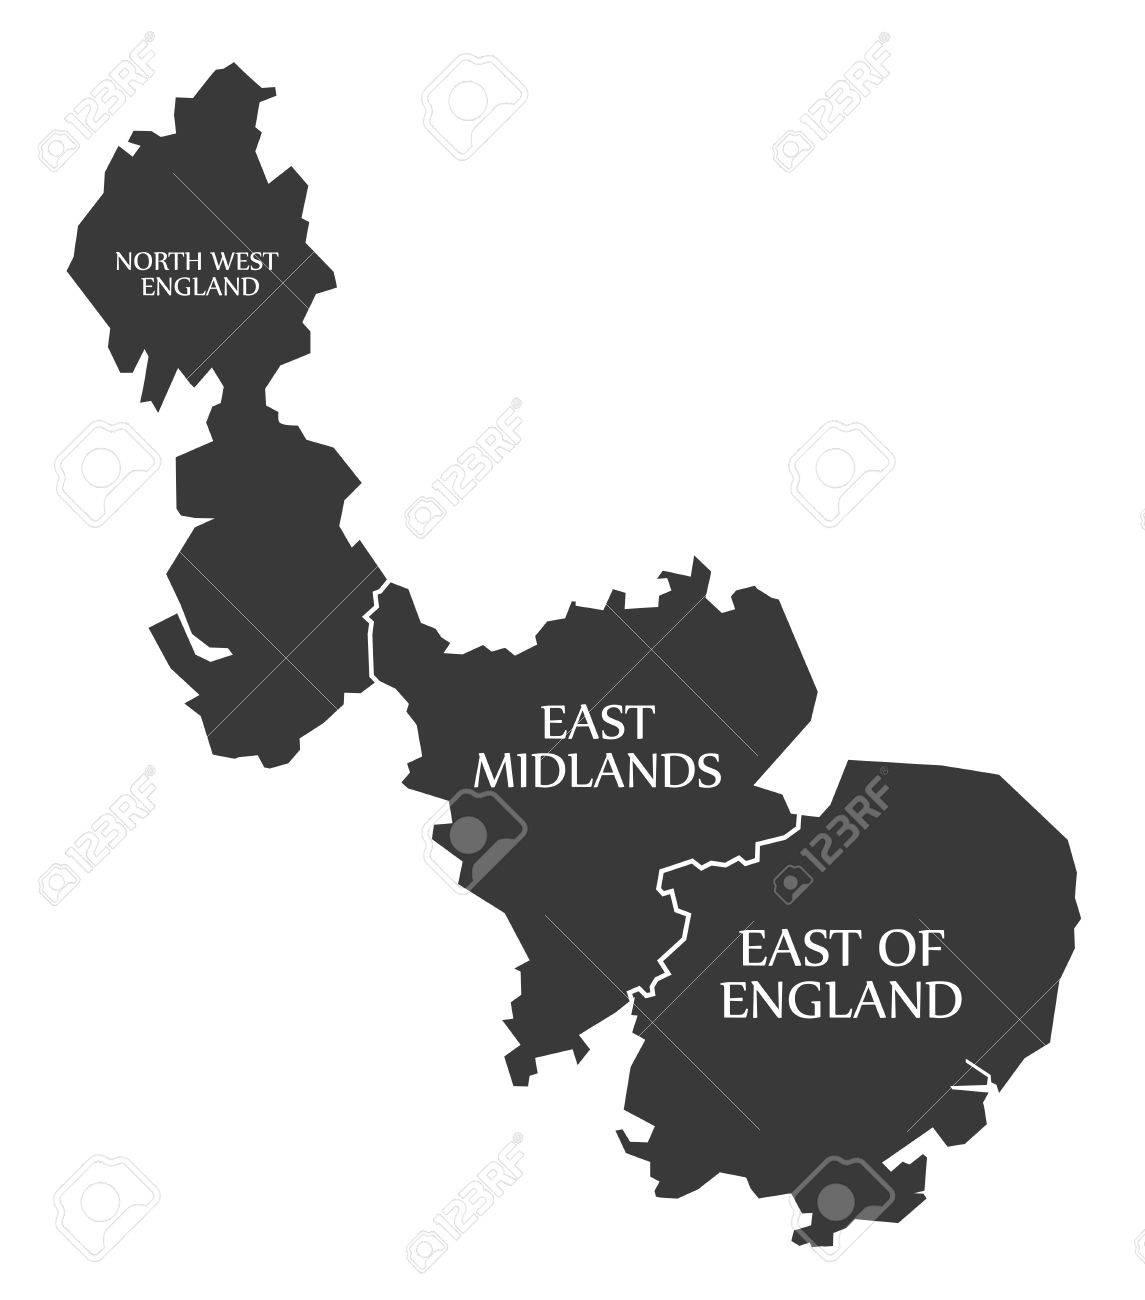 North West England East Midlands East Of England Map Uk